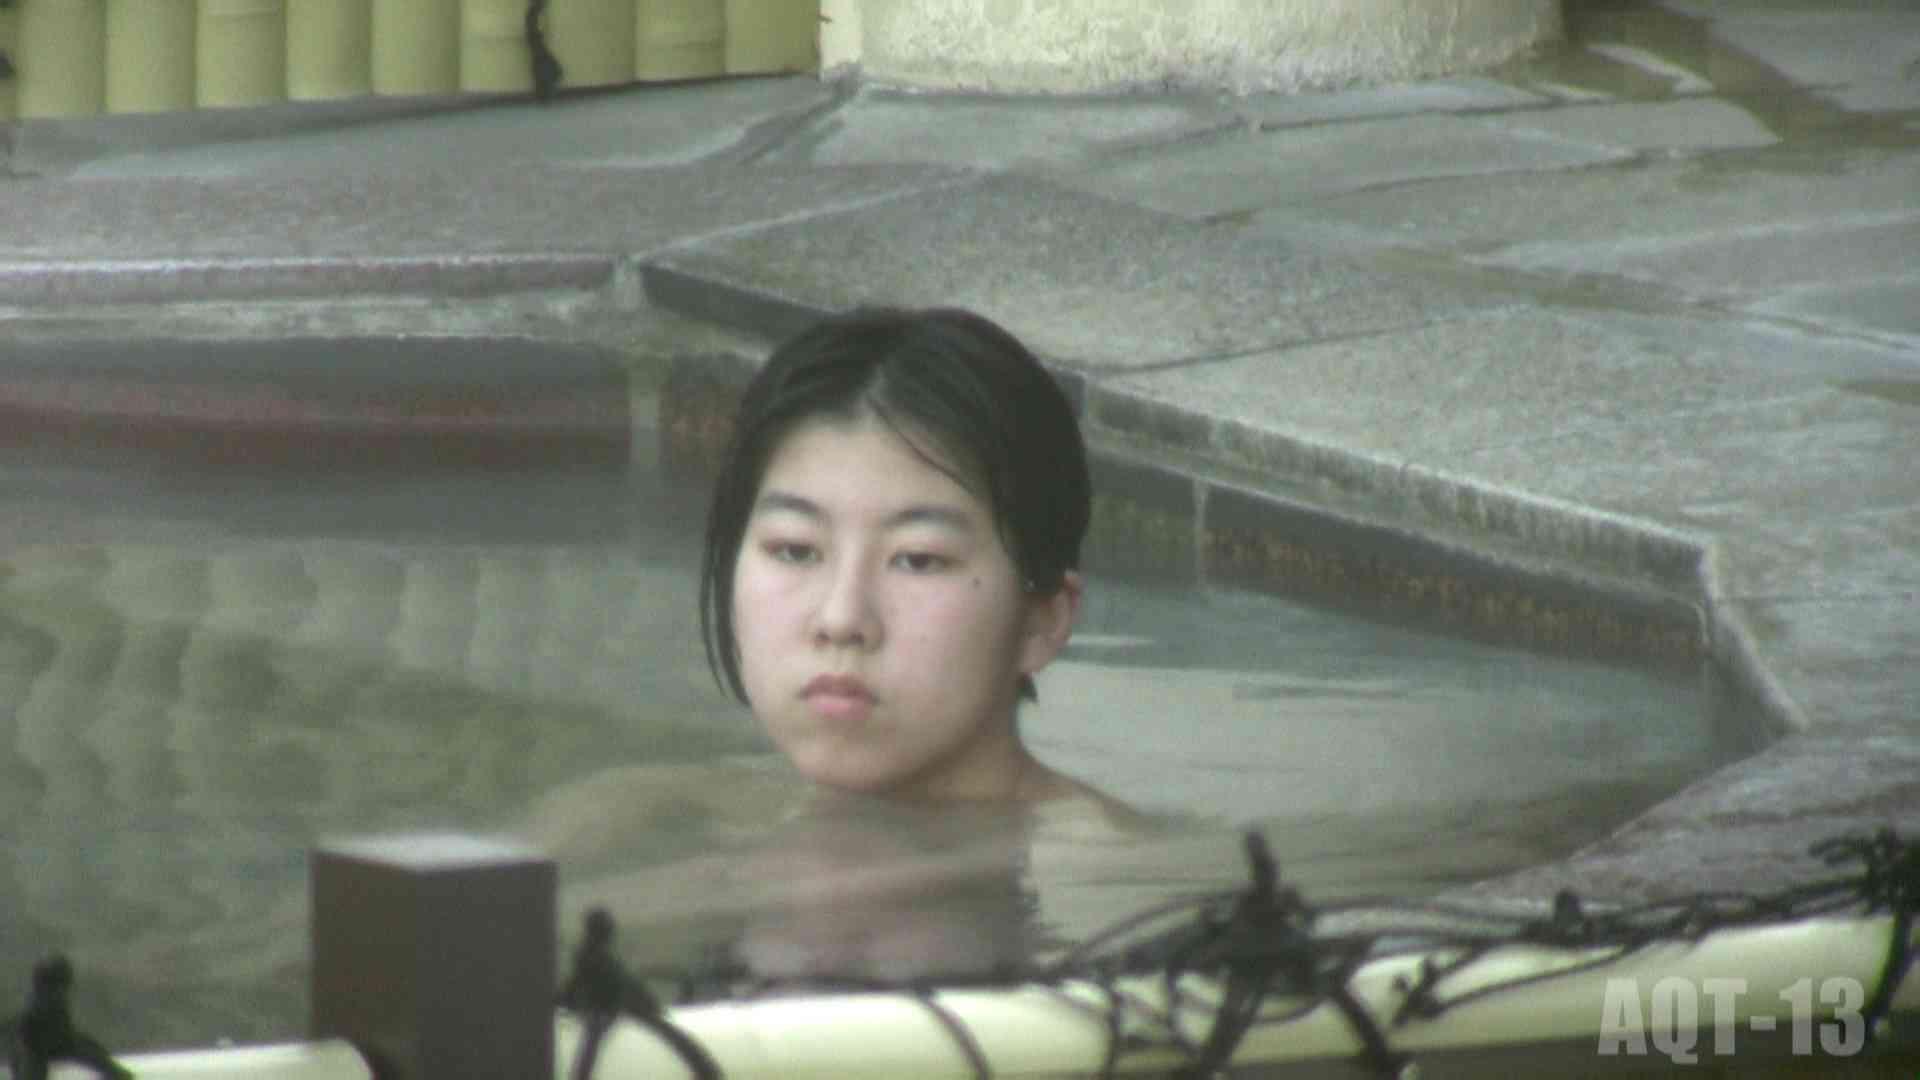 Aquaな露天風呂Vol.816 露天 AV動画キャプチャ 105PICs 41